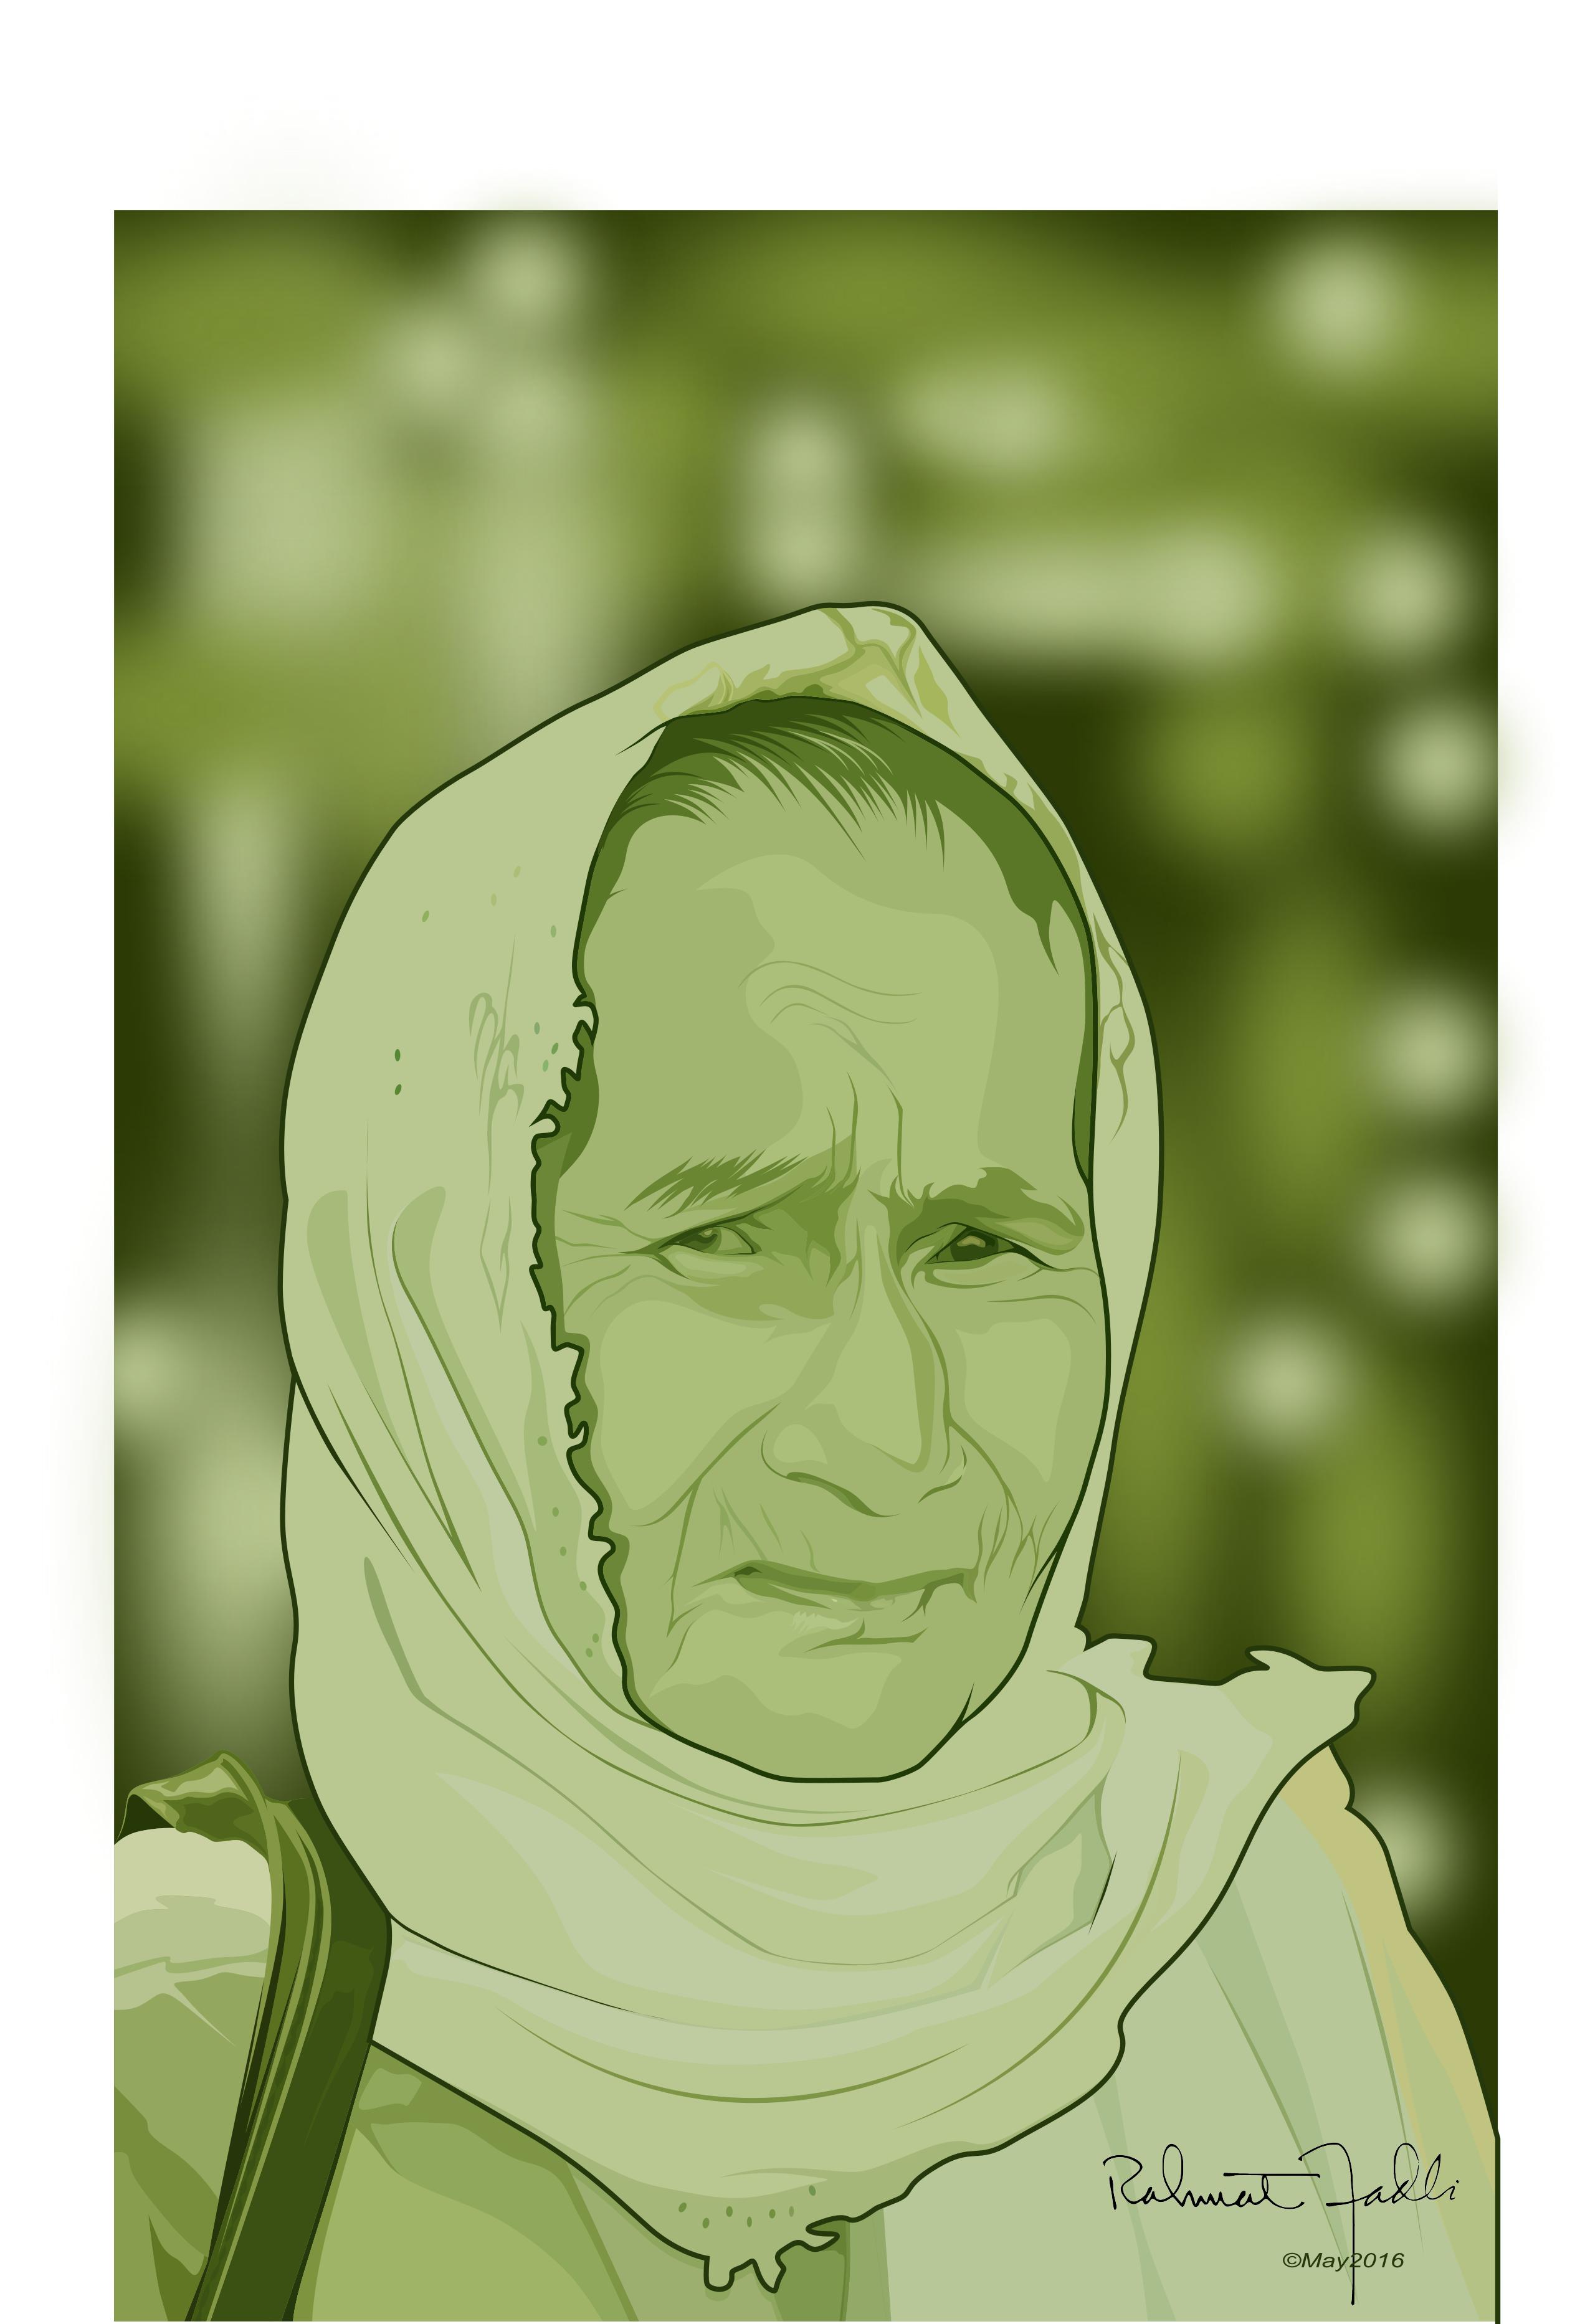 Coreldraw vector graphics - My Grandmother On Corel Draw Vector Illustration